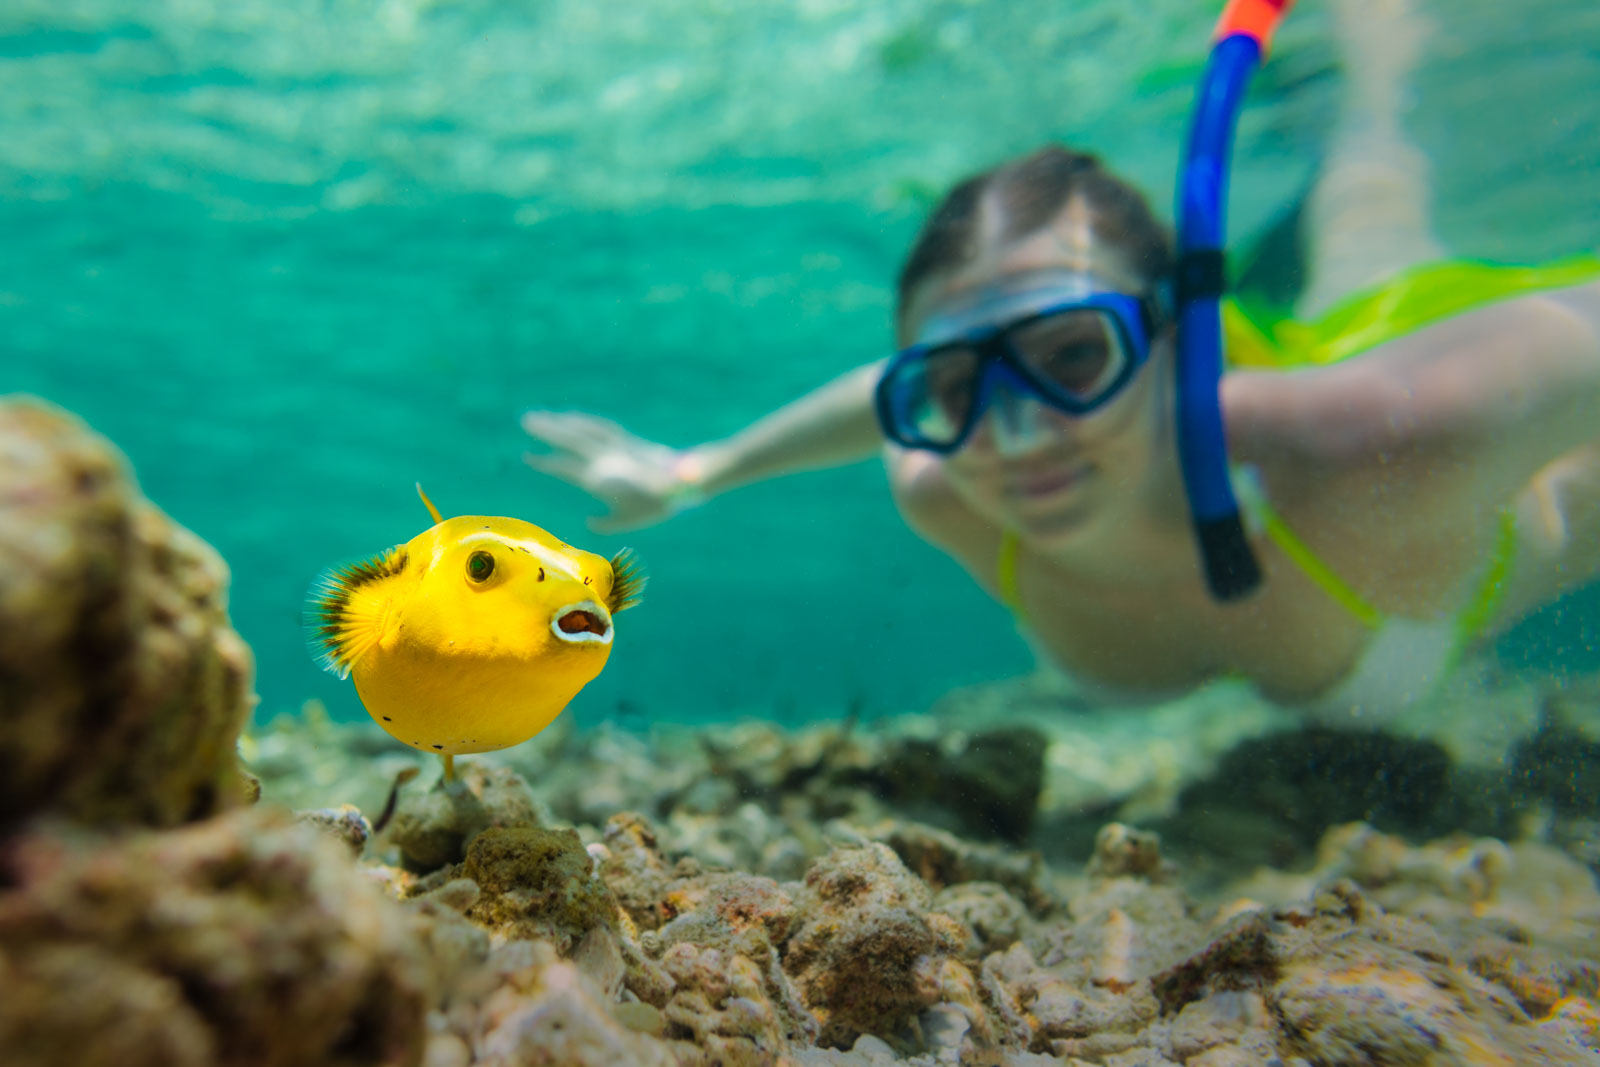 snorkeling-yellow-puffer-fish-bird-island-seychelles-wanderlust-underwater-photograper